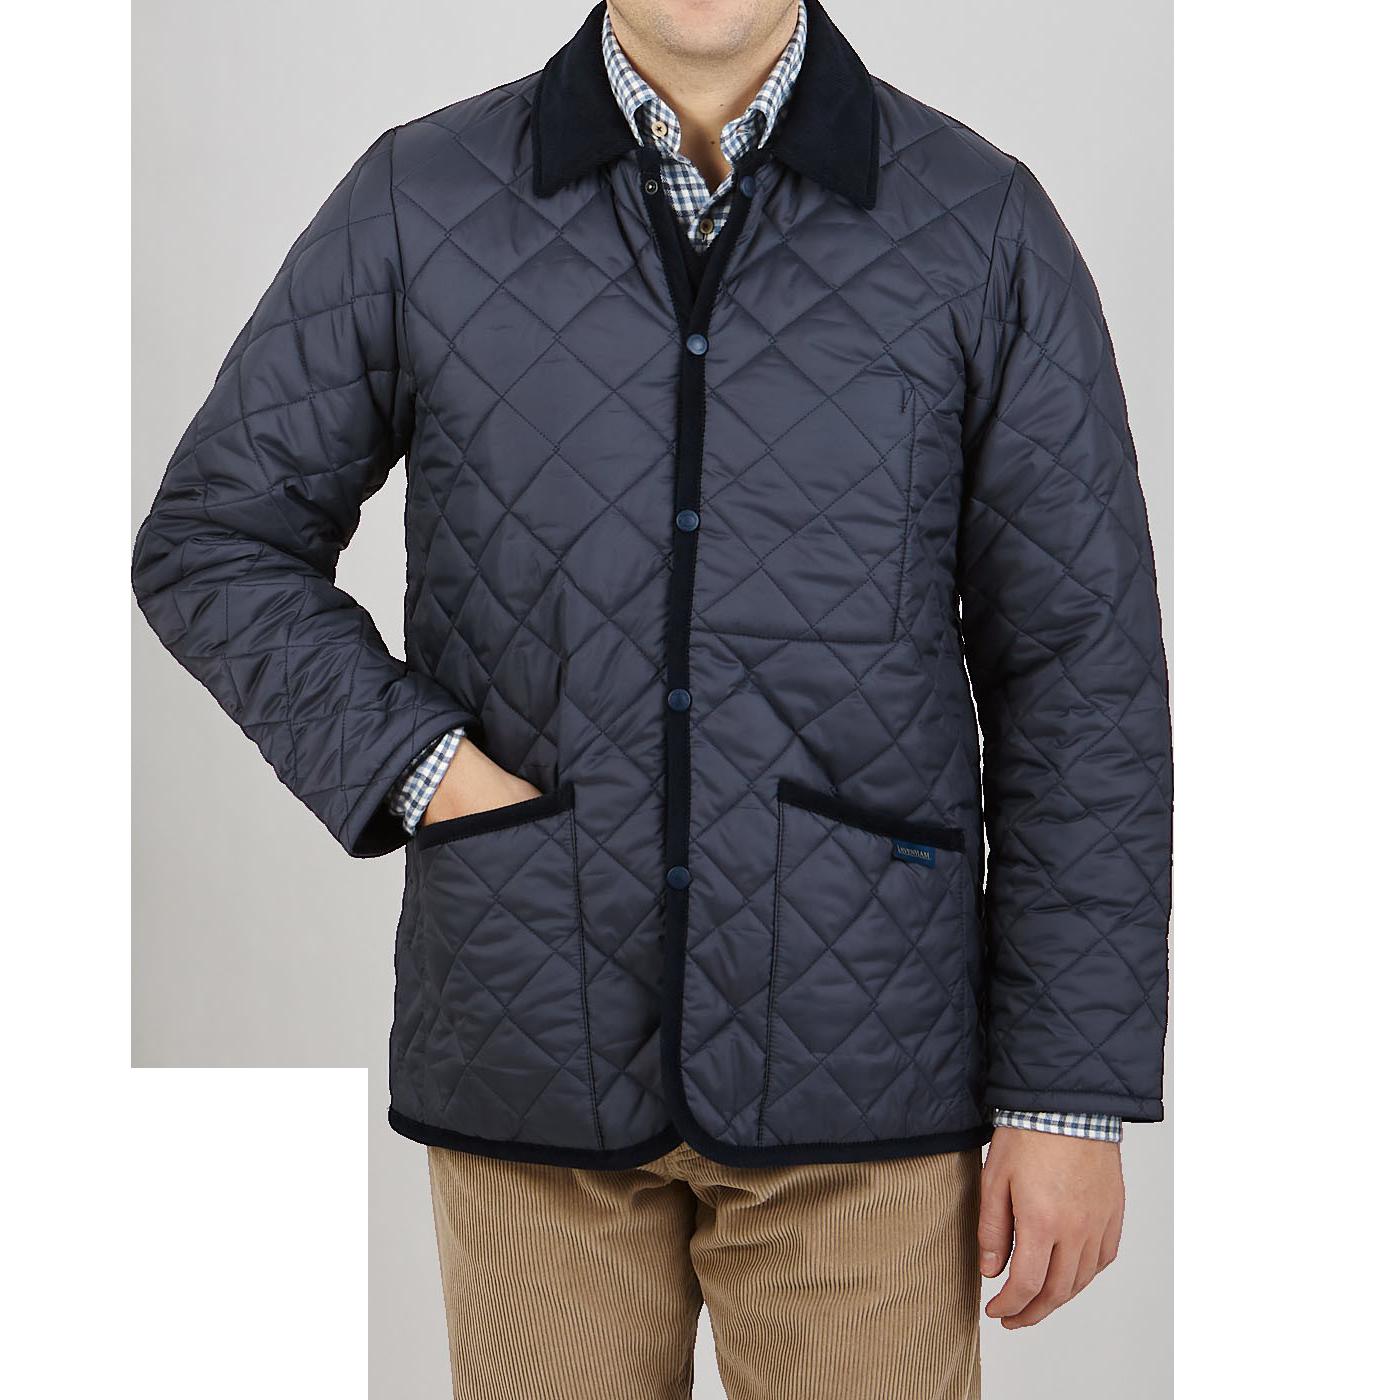 Lavenham Navy Blue Denham Technical Jacket Front